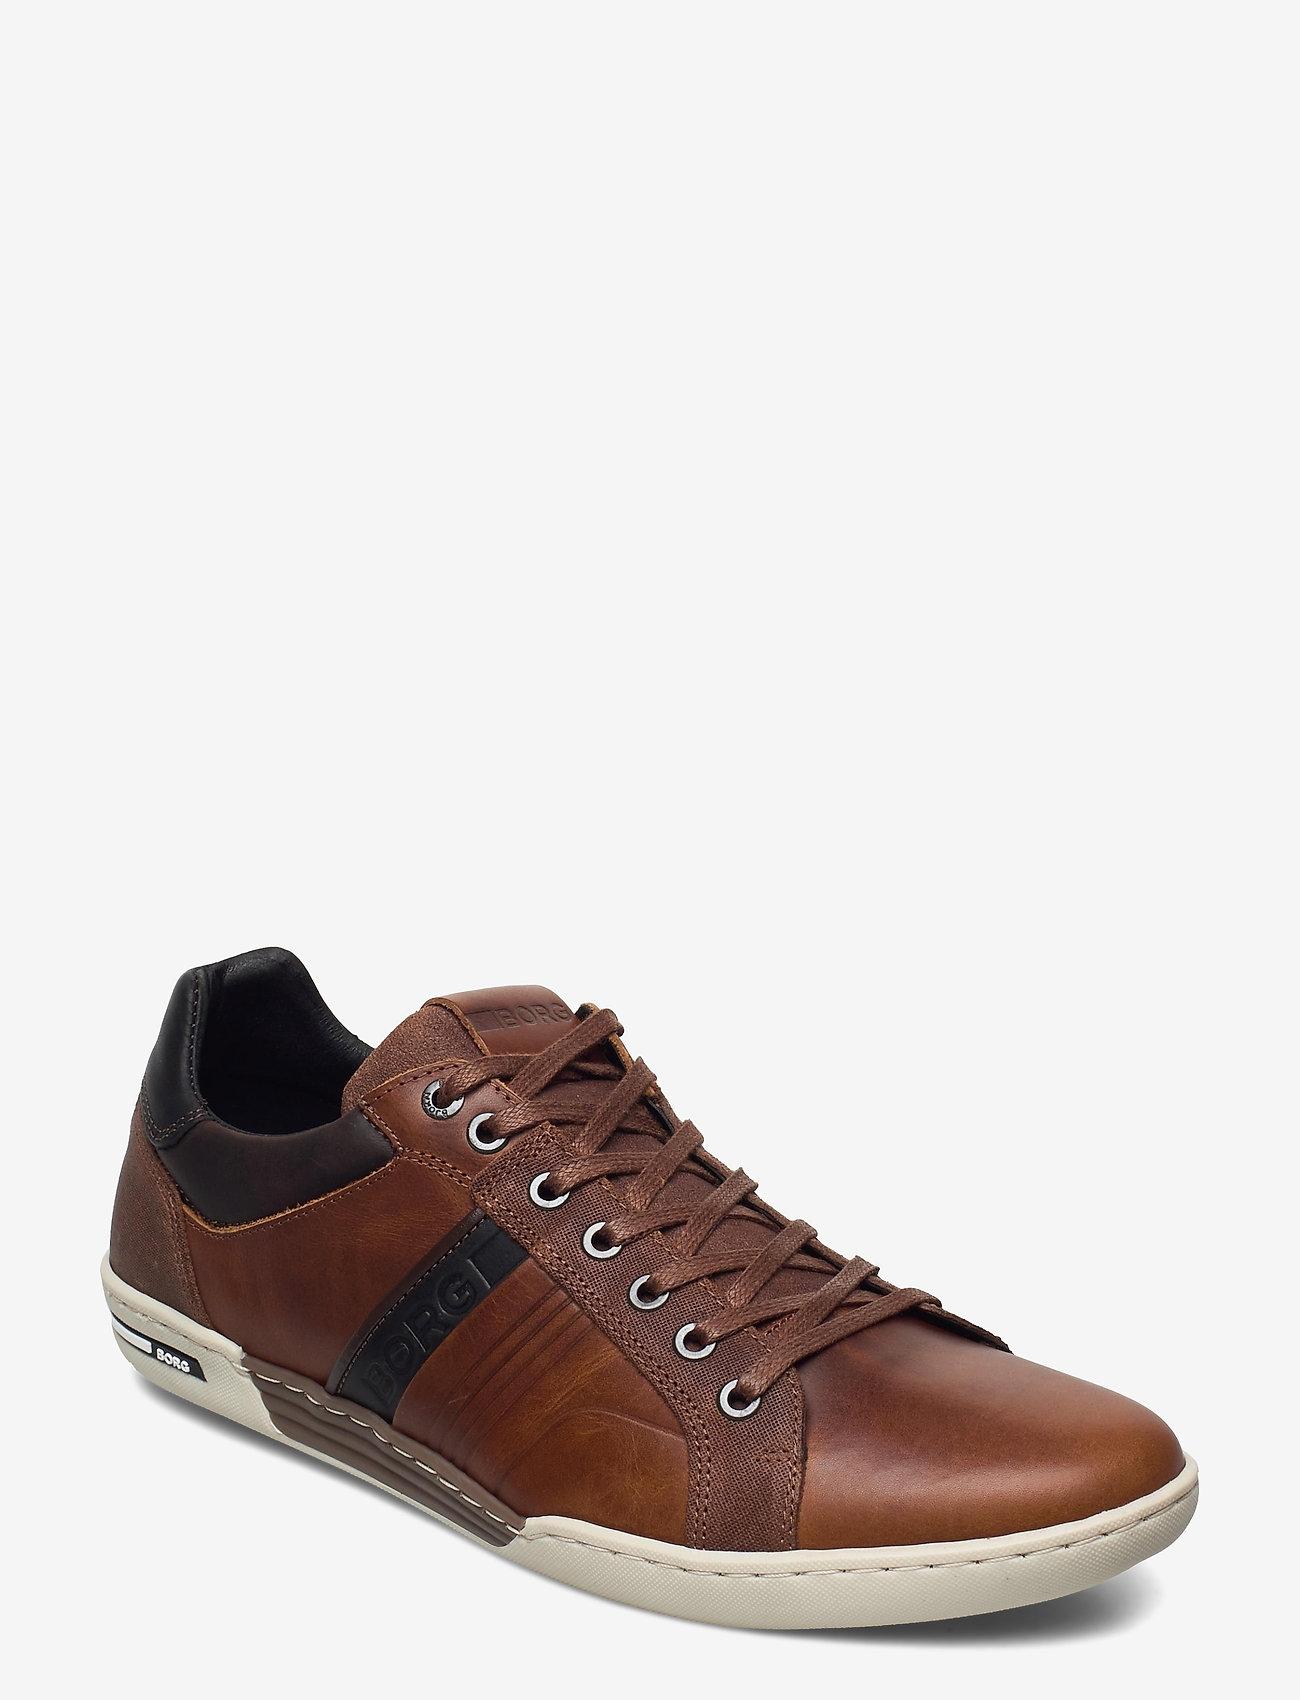 Björn Borg - COLTRANE NU LUX M - laag sneakers - tan - 0